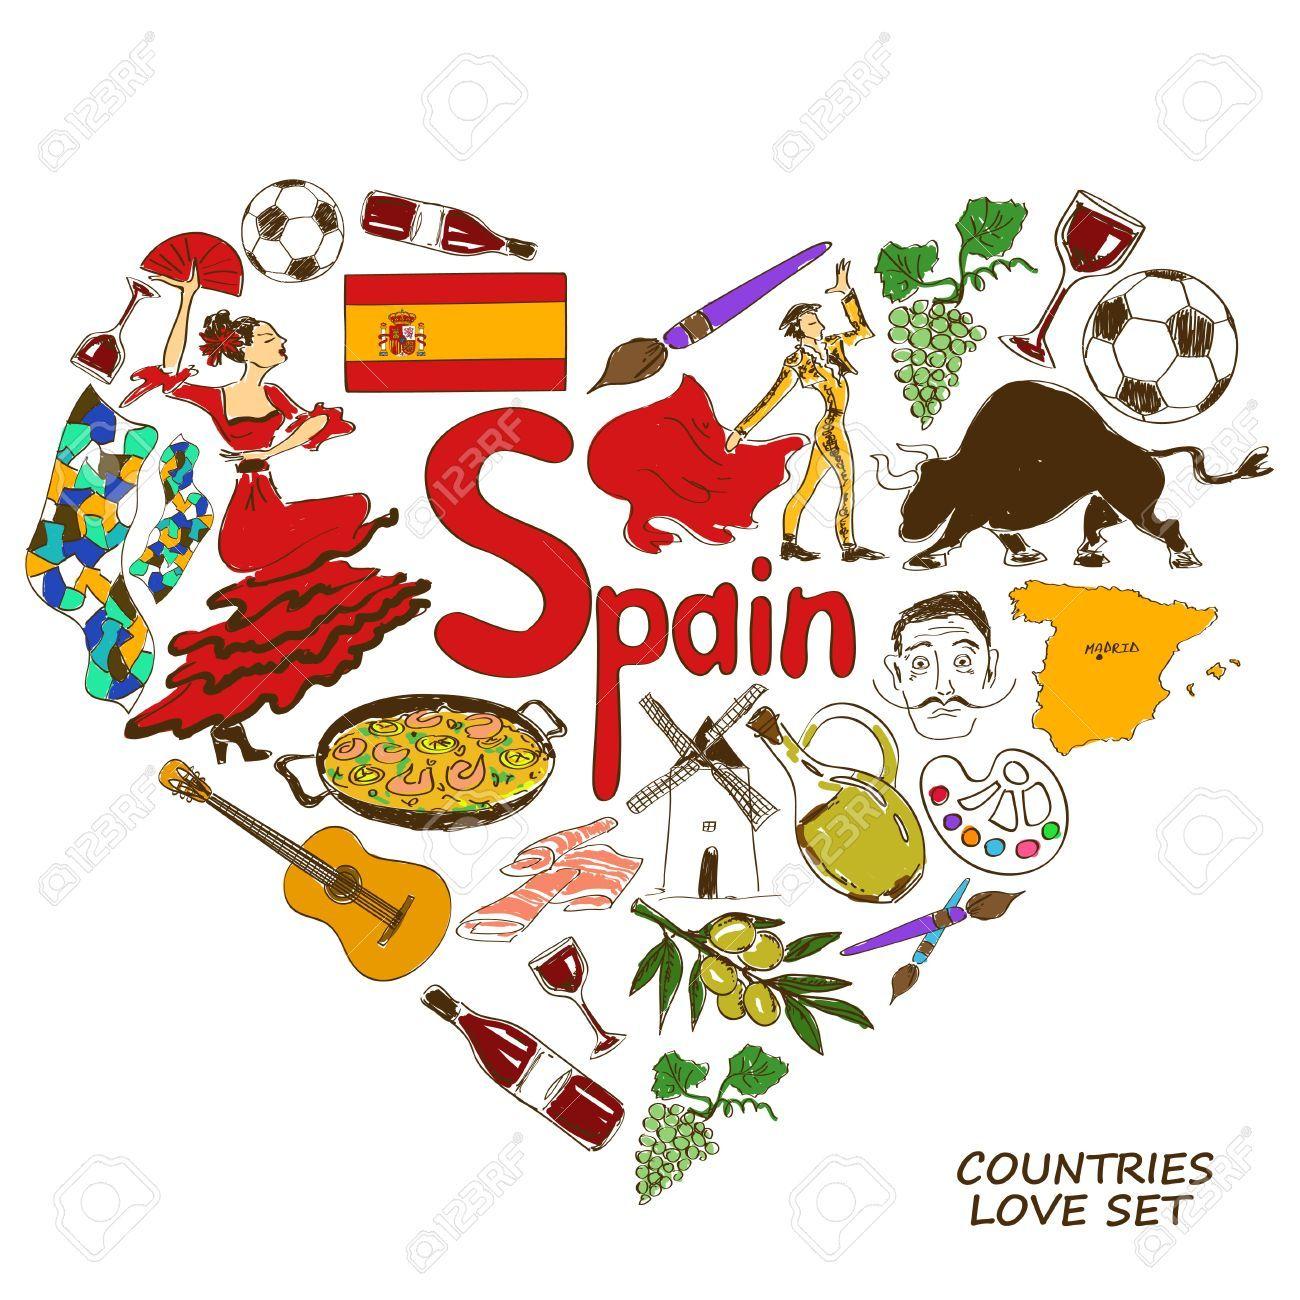 Colorful Collection Croquis De Symboles Espagnols Coeur Concept De Forme Fond Voyage Symbole Espagnol Croquis Espagnol